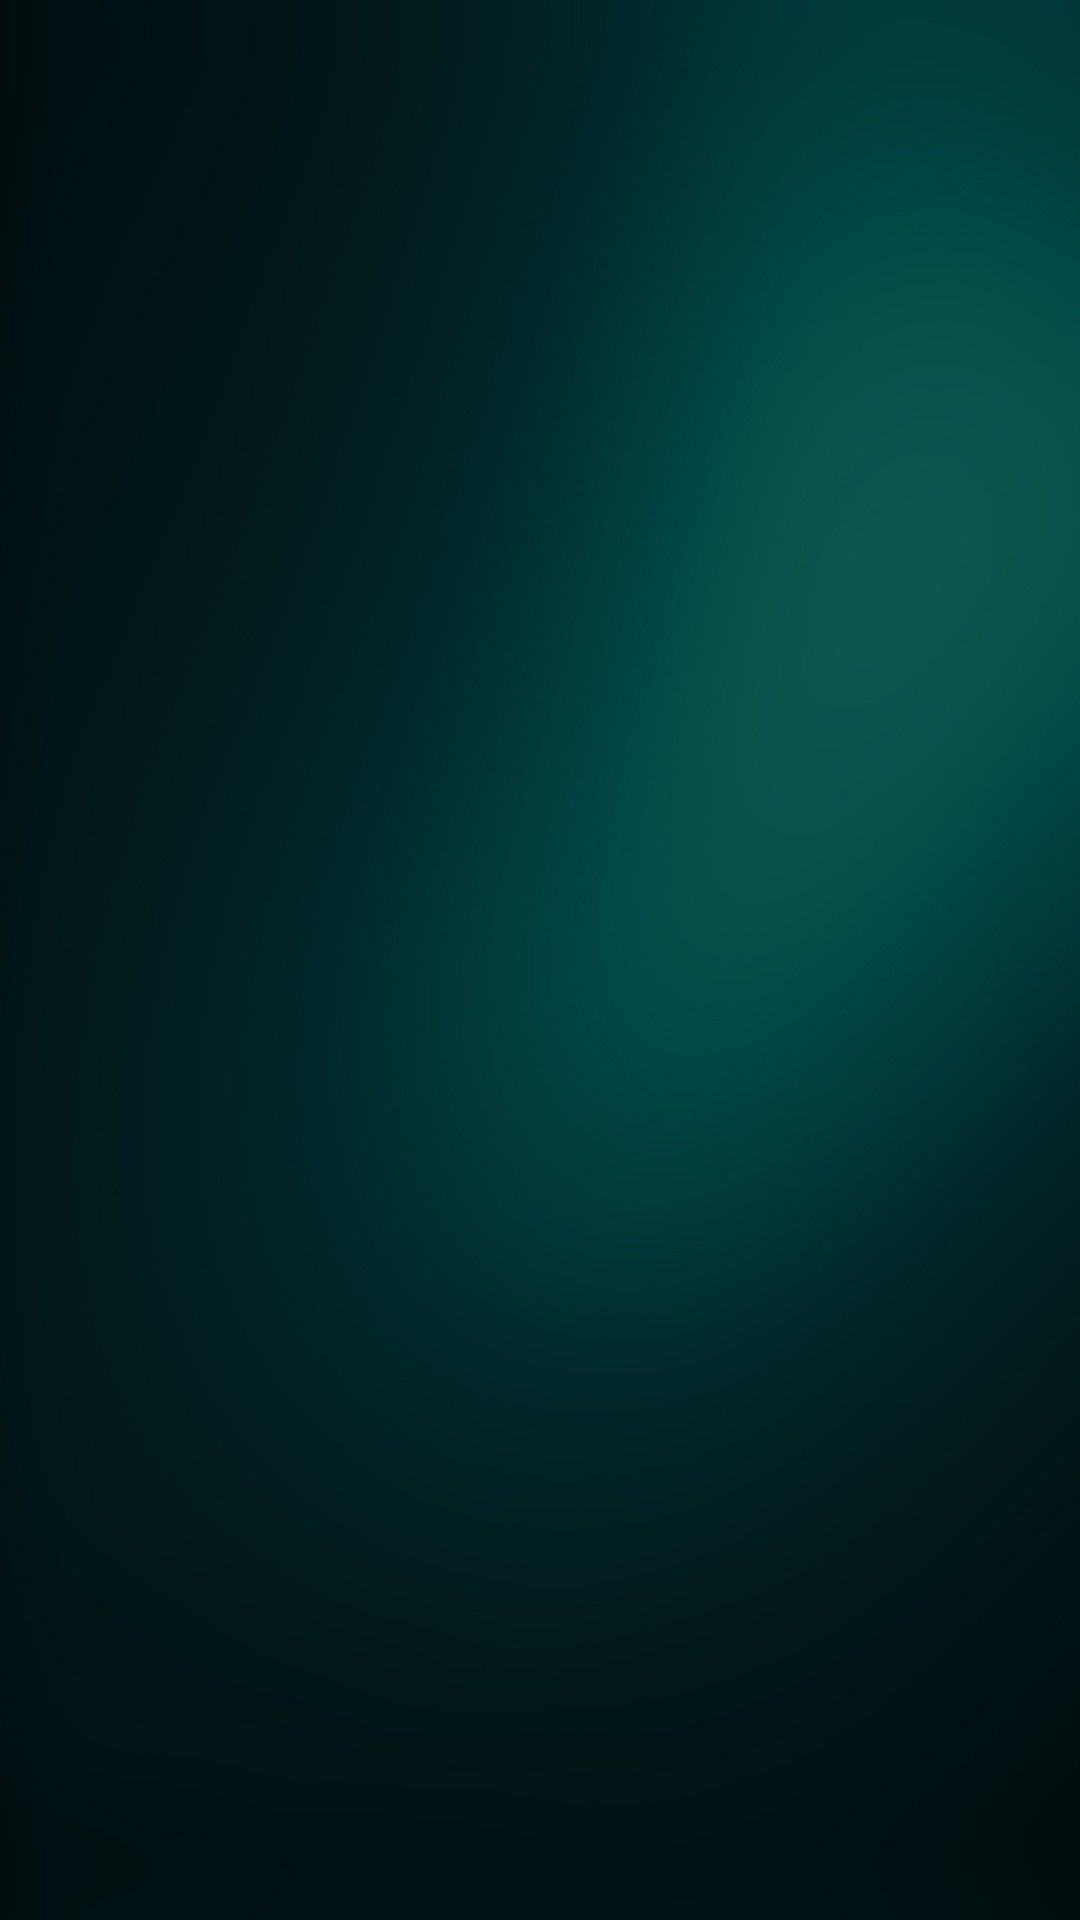 Dark green iPhone wallpapers | Blue Wallpaper! | Colorful wallpaper, Plain wallpaper, Blue ...